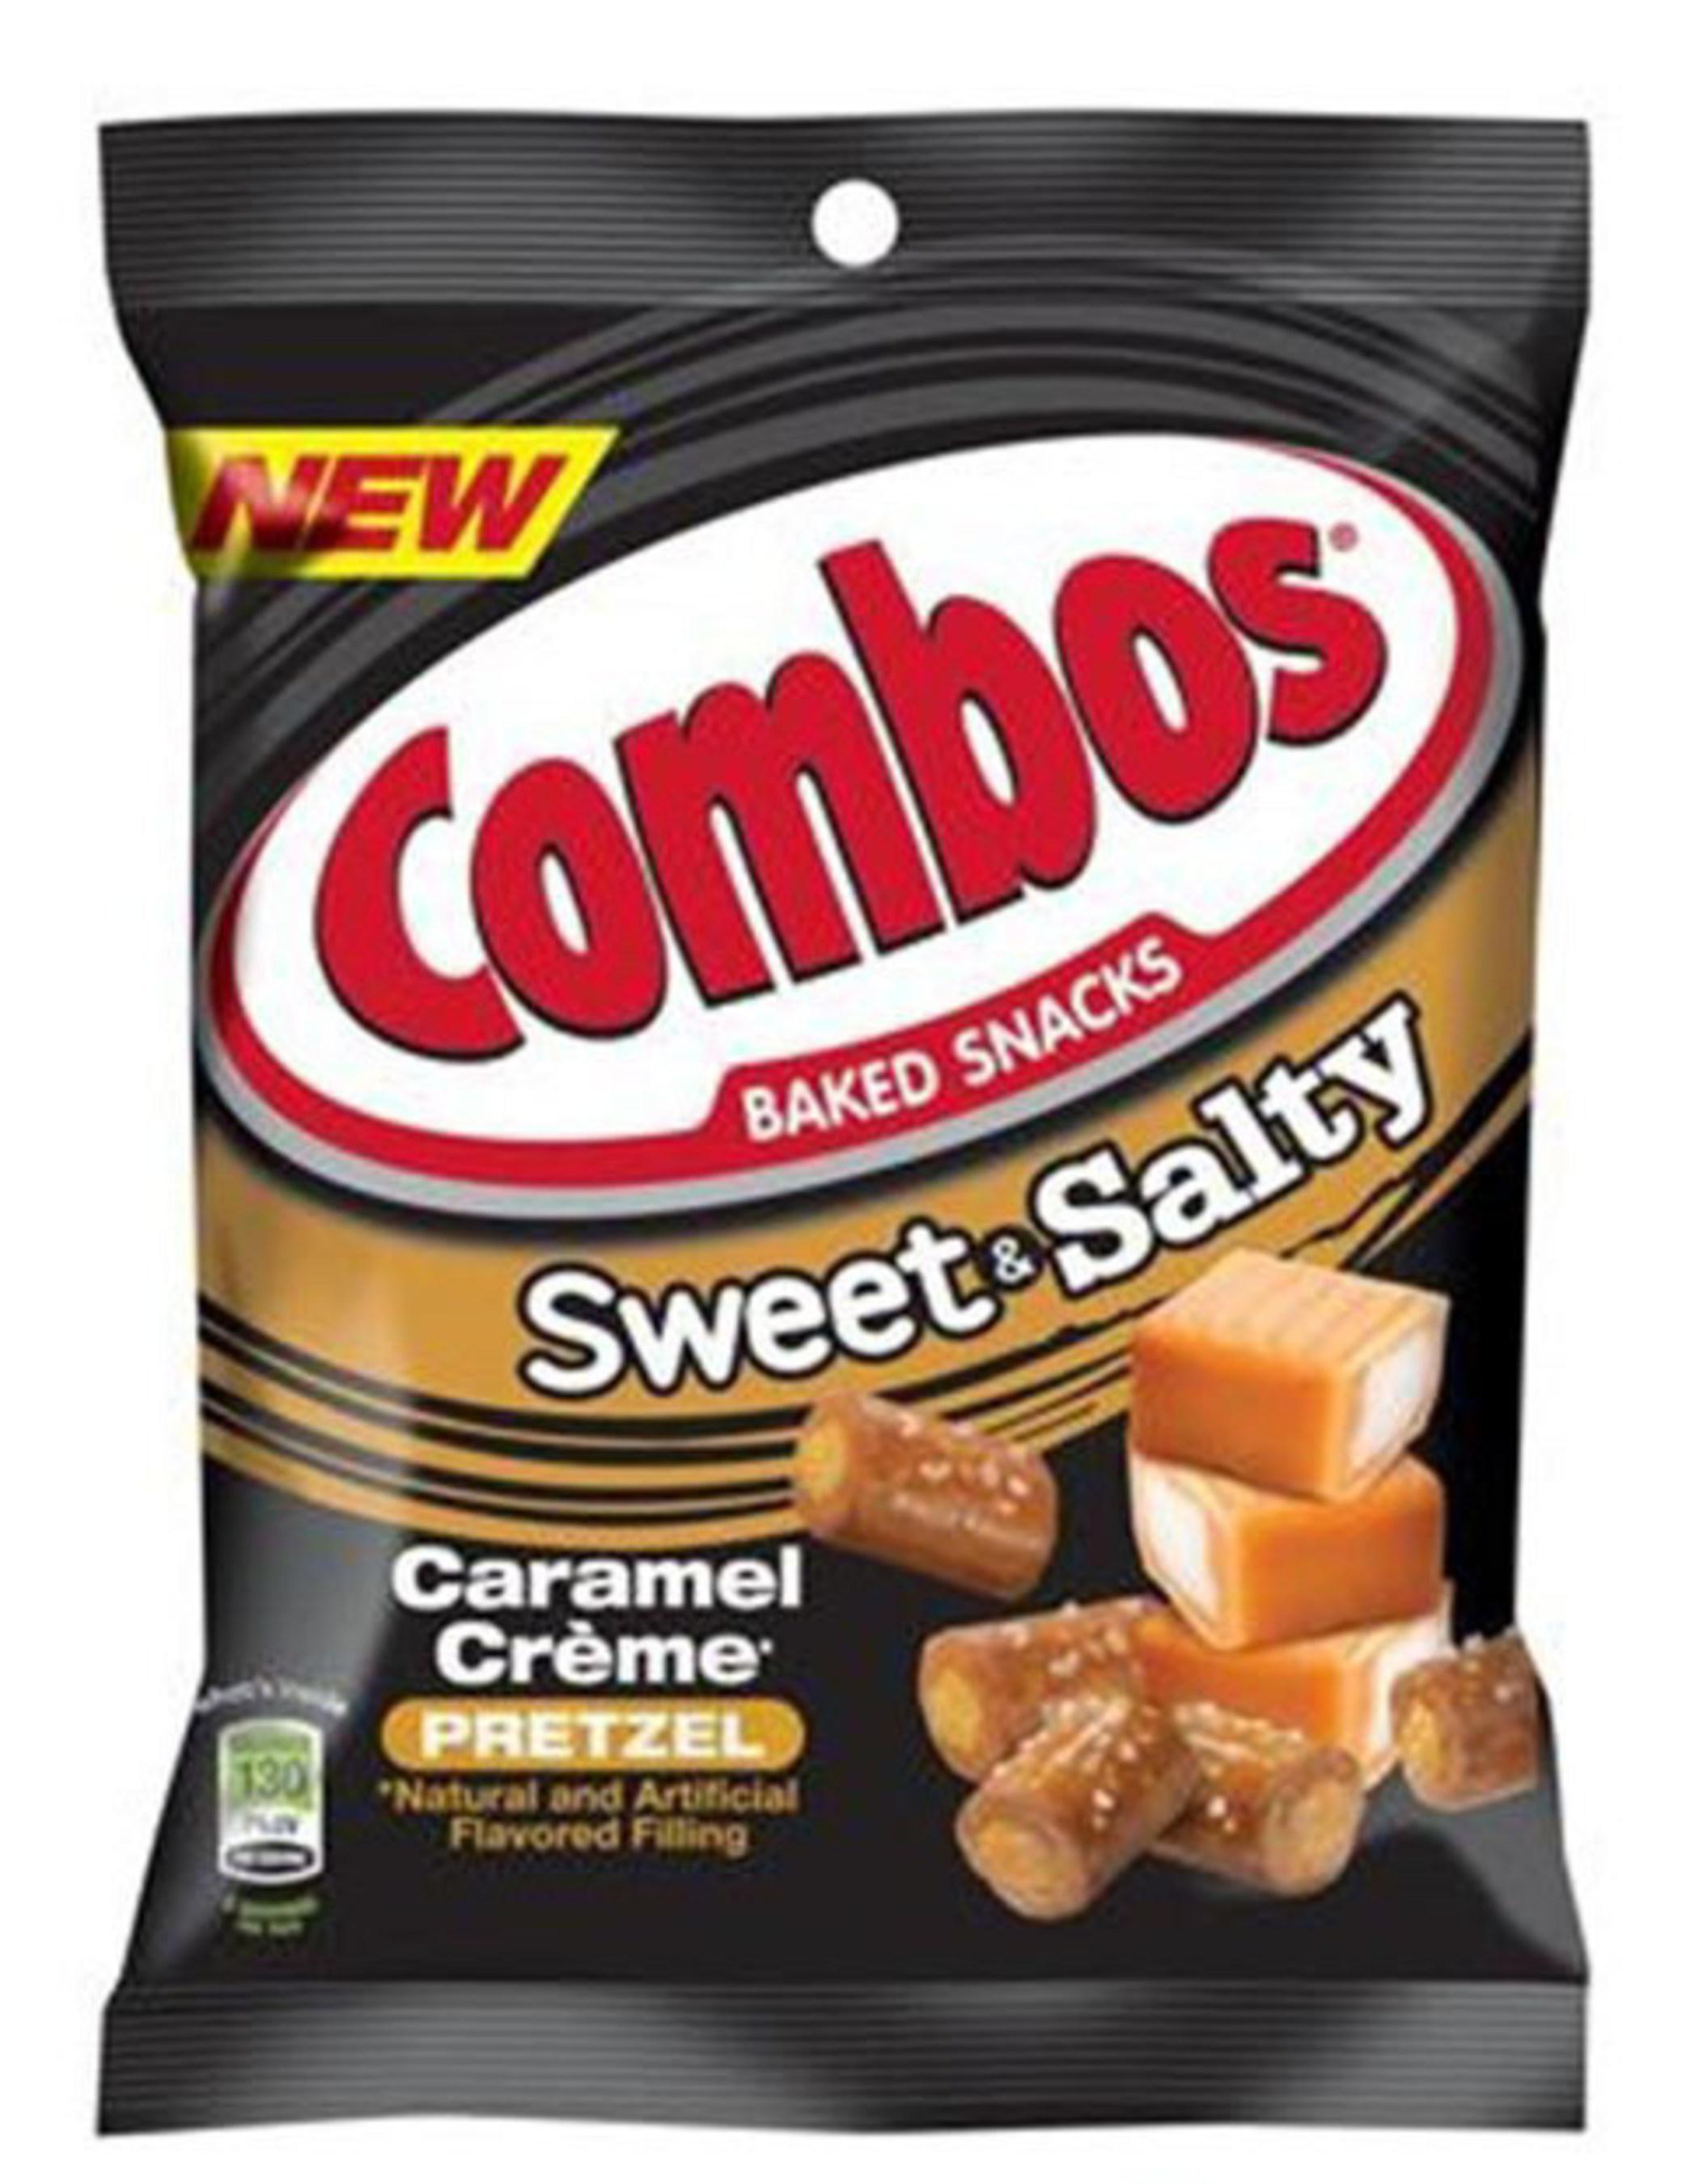 COMBOS SWEET AND SALTY CARAMEL CREME PRETZEL - FAMILY PEG PACK - 6.0 OZ - 12/CA